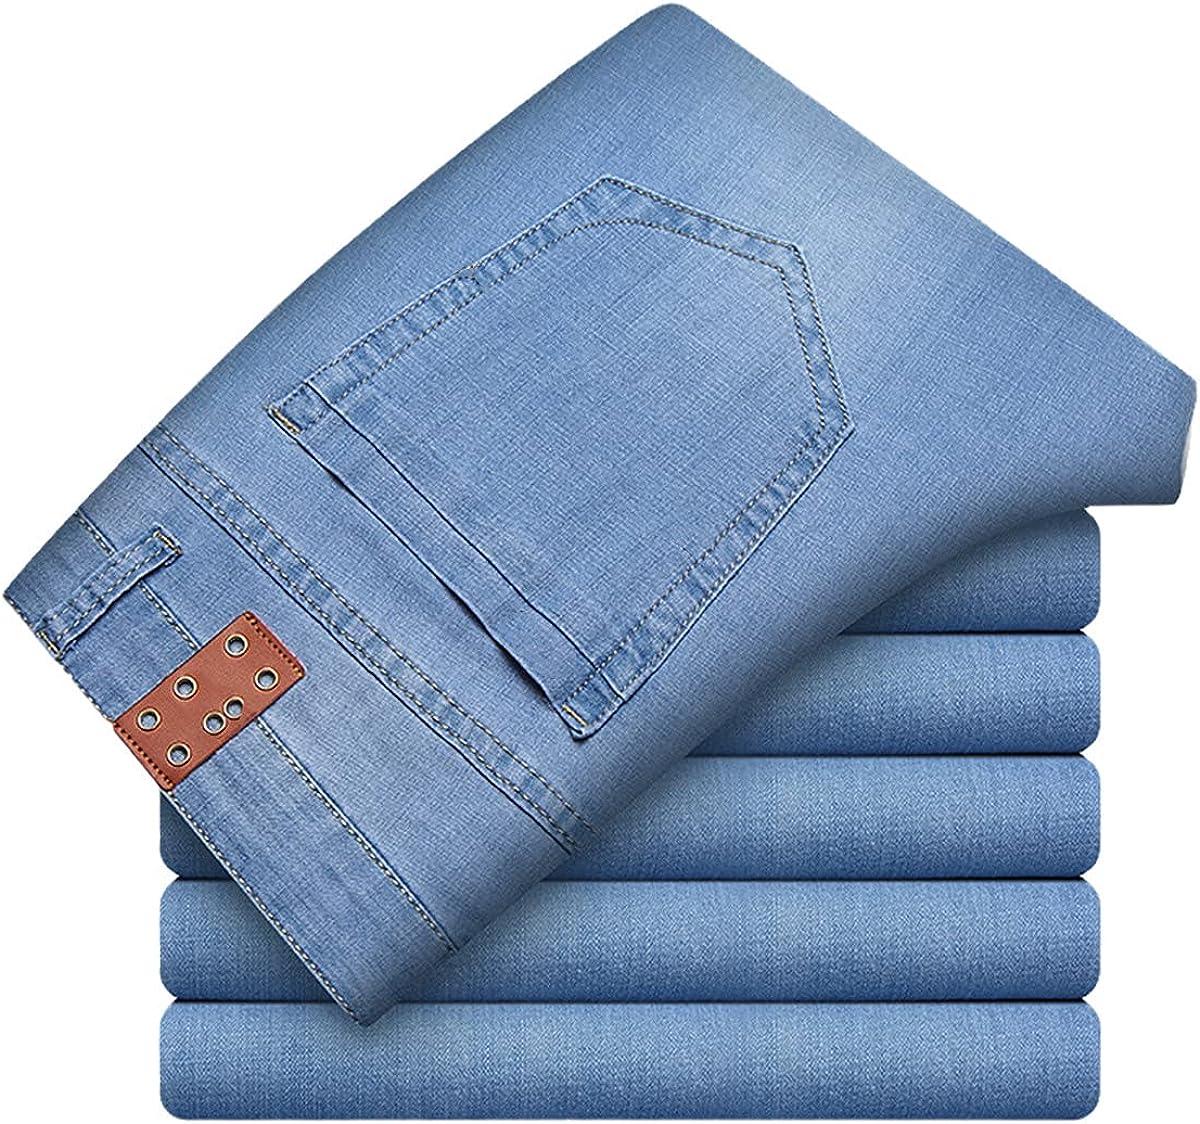 CACLSL Skinny Jeans Men's Fashion Men's Business Stretch Denim Trousers Casual Light Blue Retro Dress Pants Summer Jeans